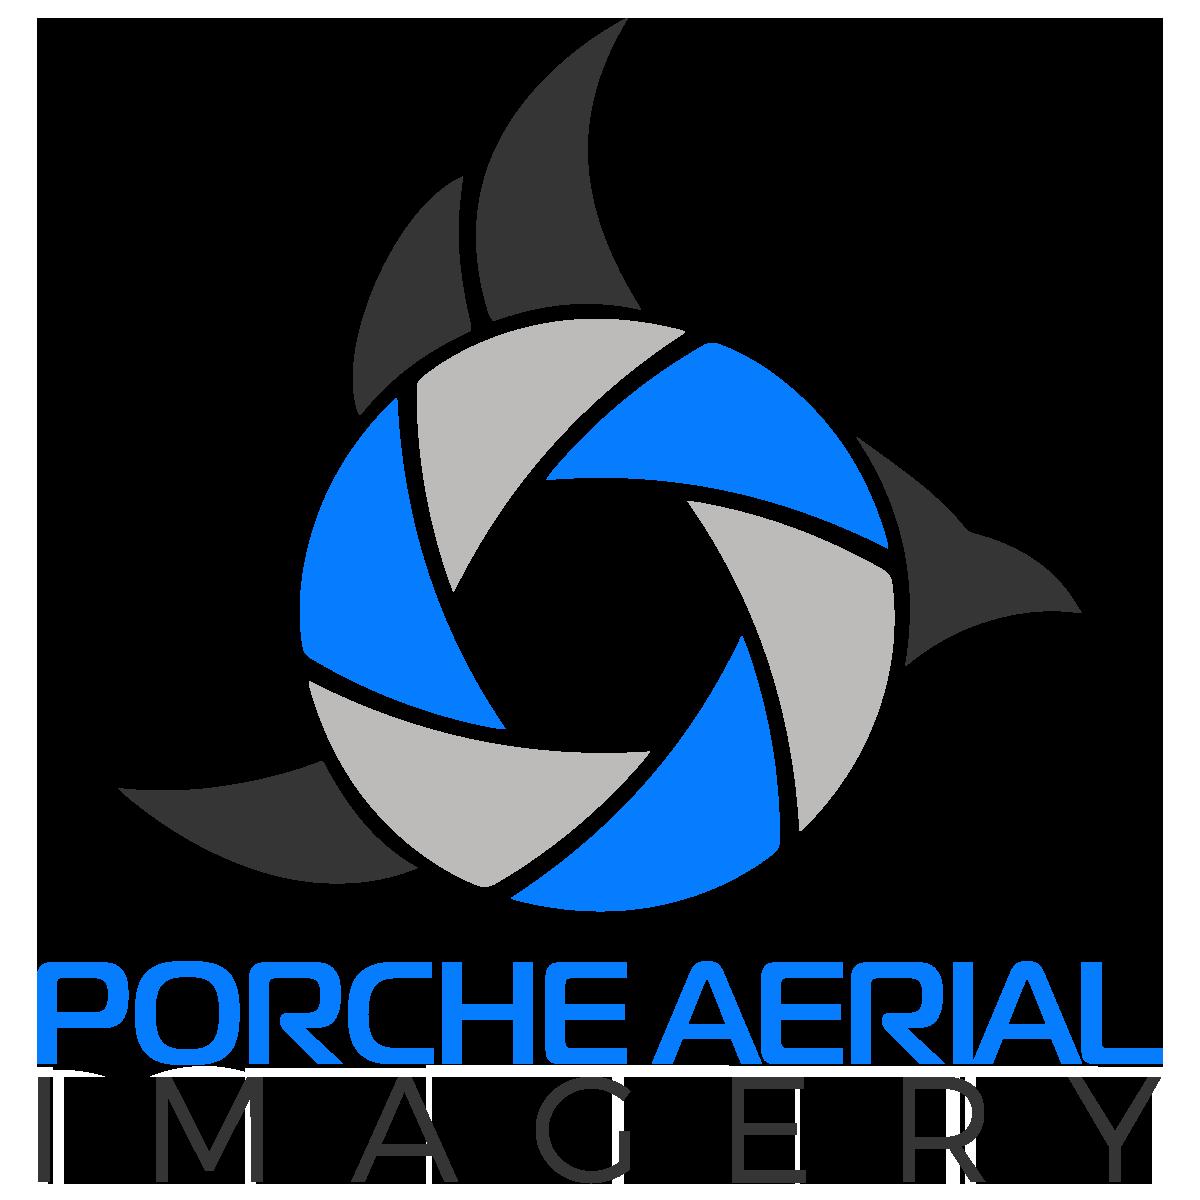 Porche Aerial Imagery